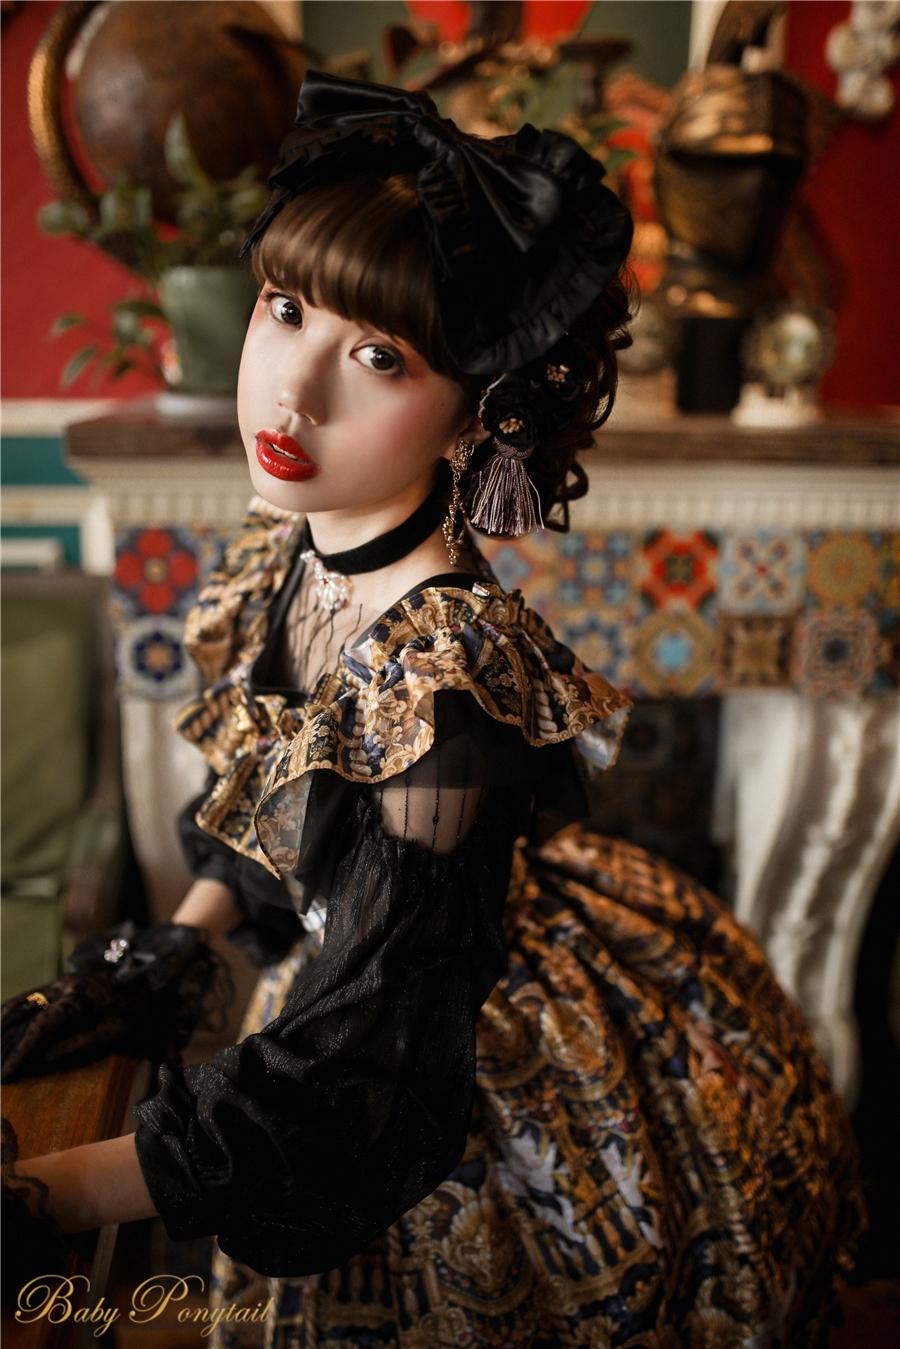 Babyponytail_Model_Ruffle Collar JSK_Black Present Angel_Kaka_16.jpg